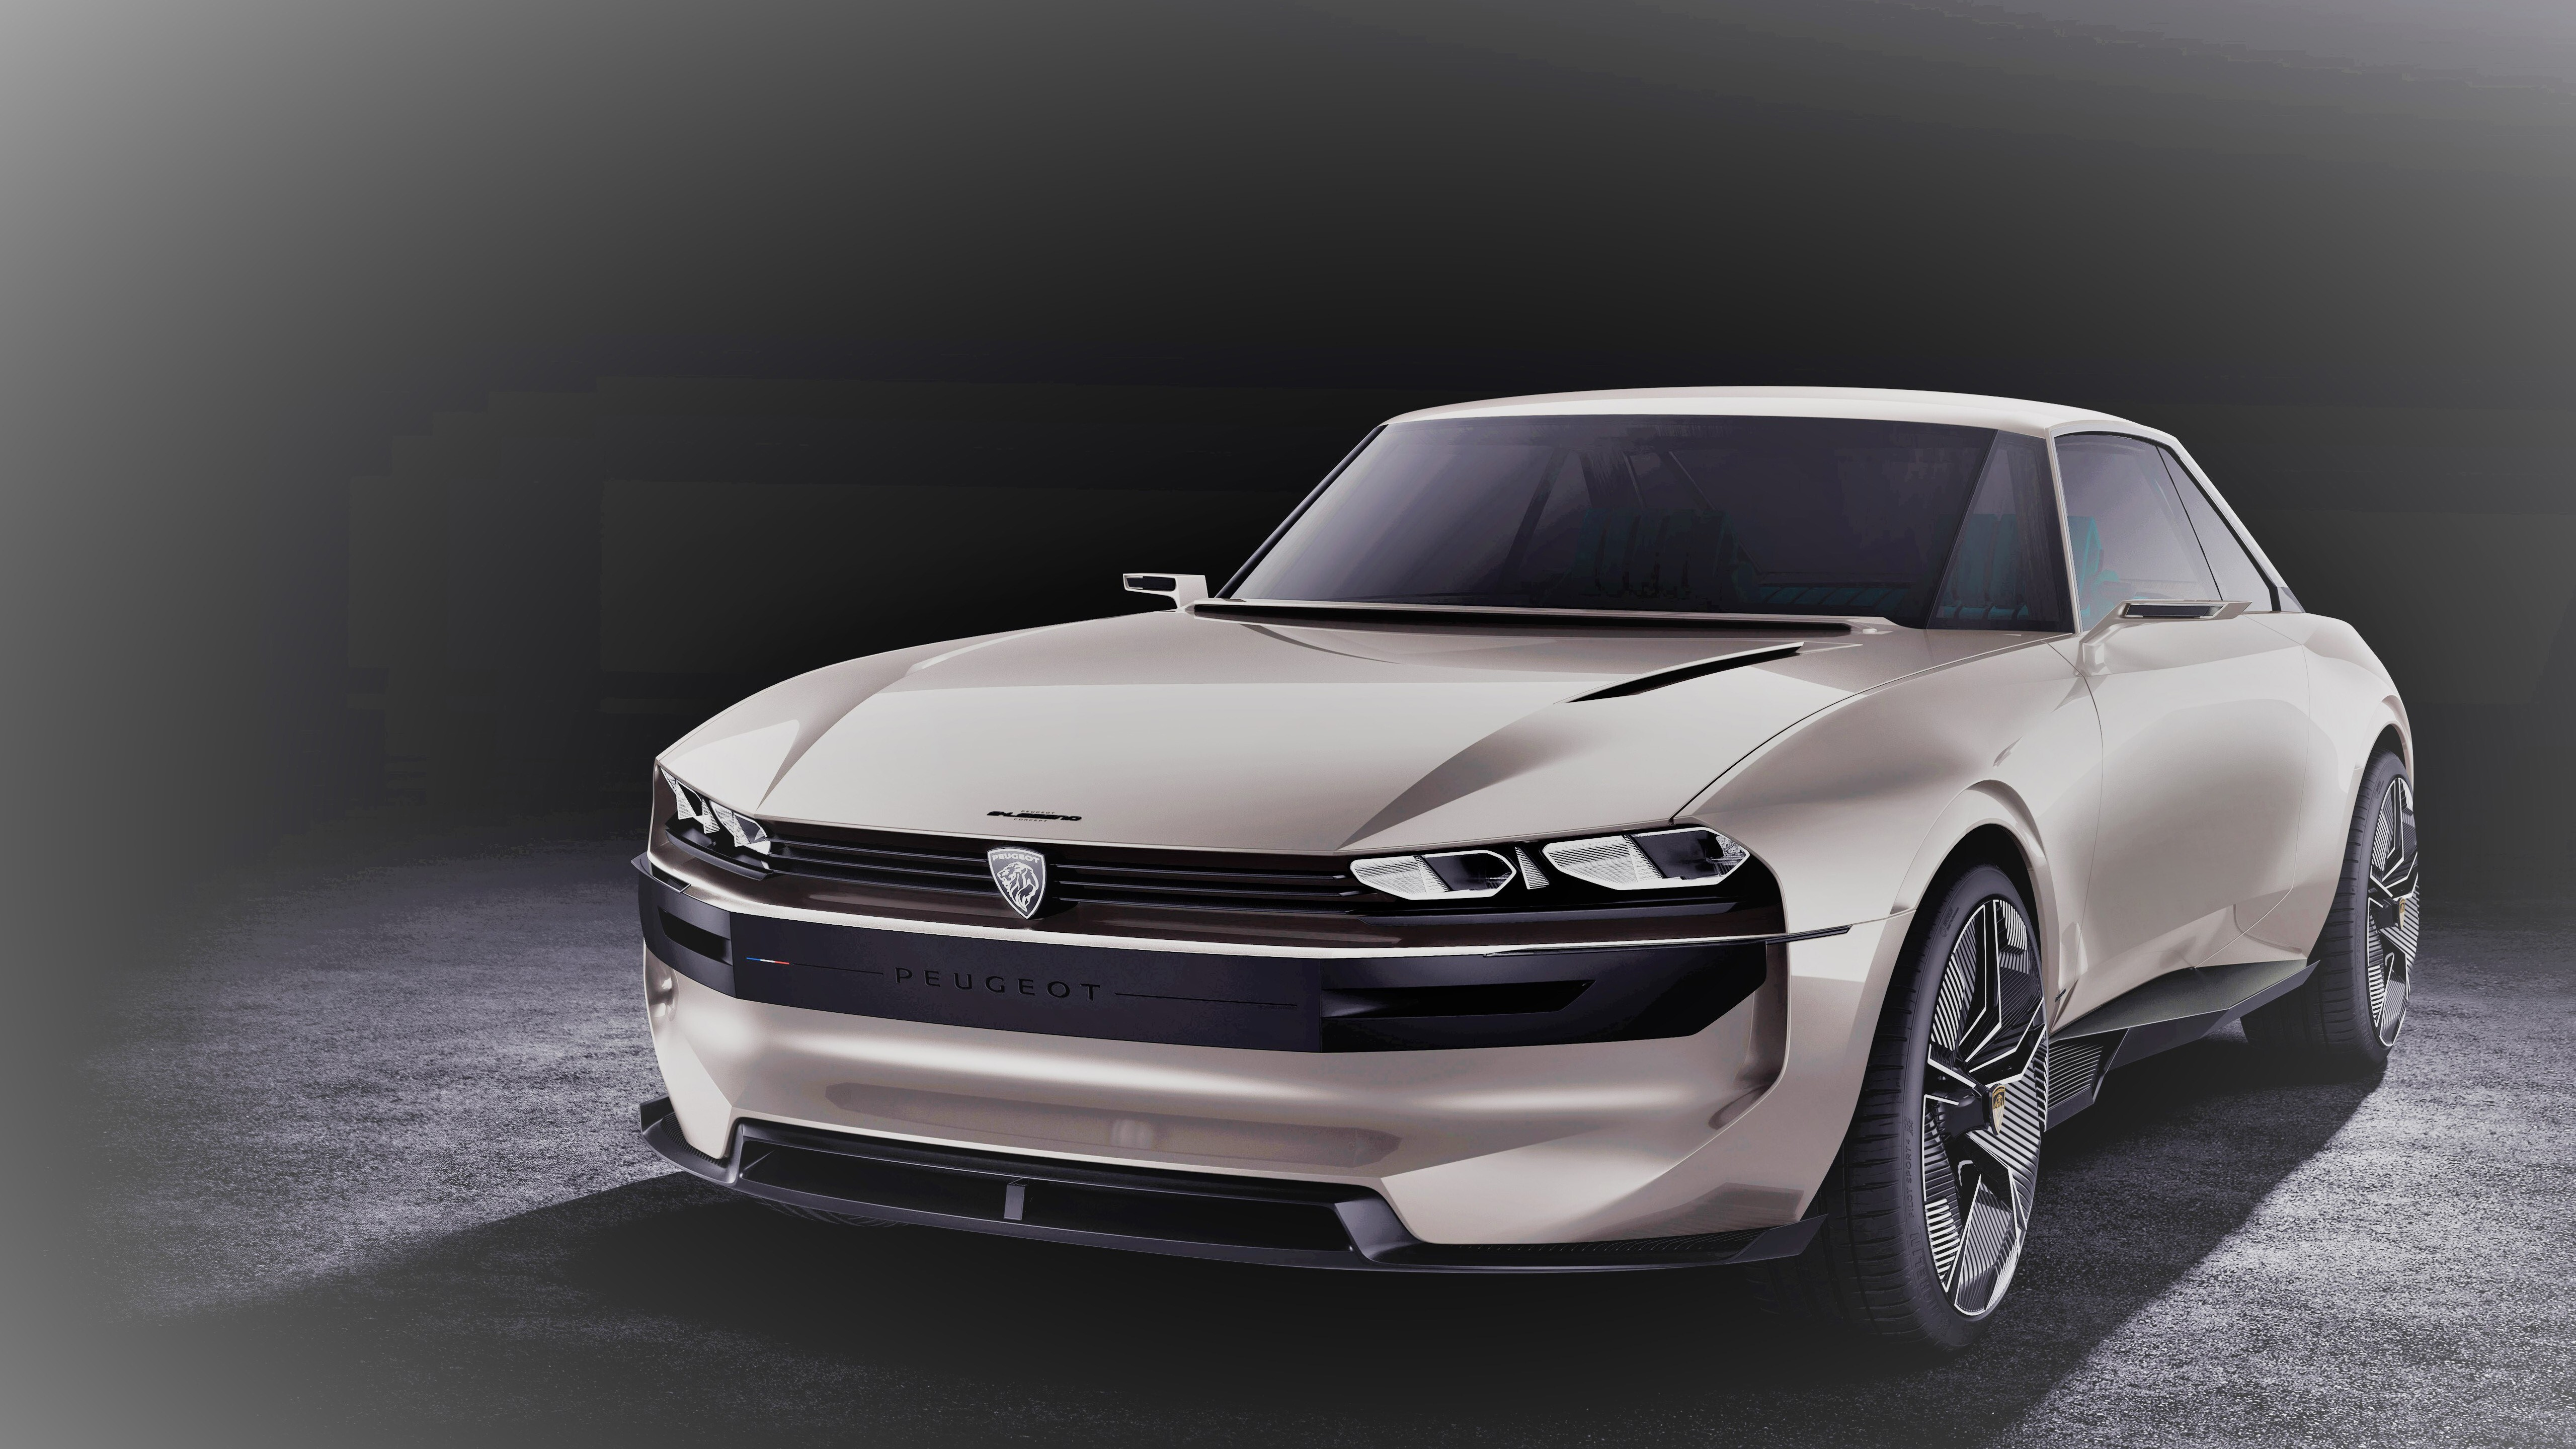 Image Peugeot Elegend Concept Car Wallpapers